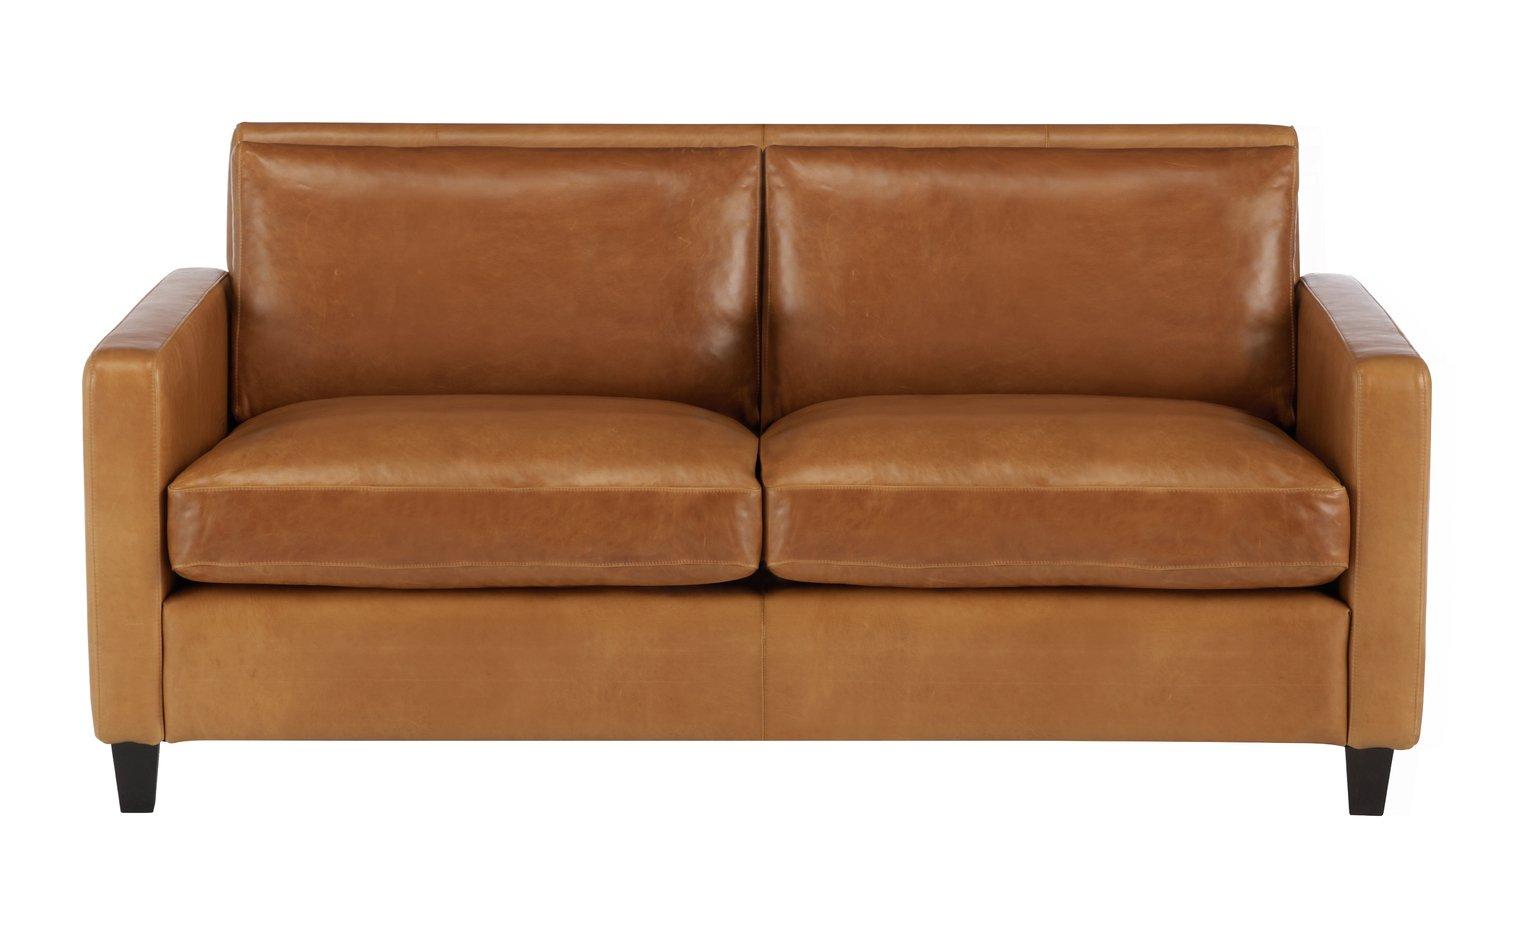 Habitat Chester 2 Seater Leather Sofa - Mid Tan